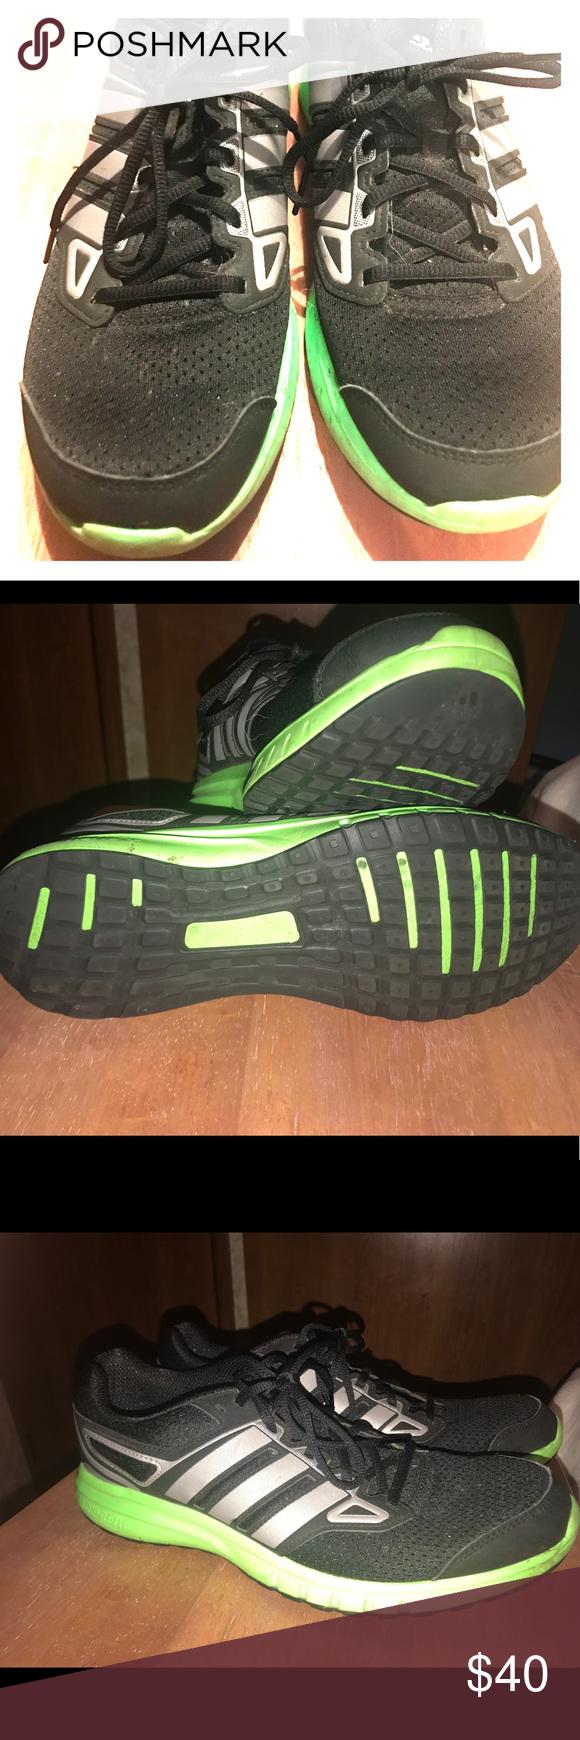 adidas adiprene   scarpe da corsa, scarpe da ginnastica, adidas e scarpe sportive